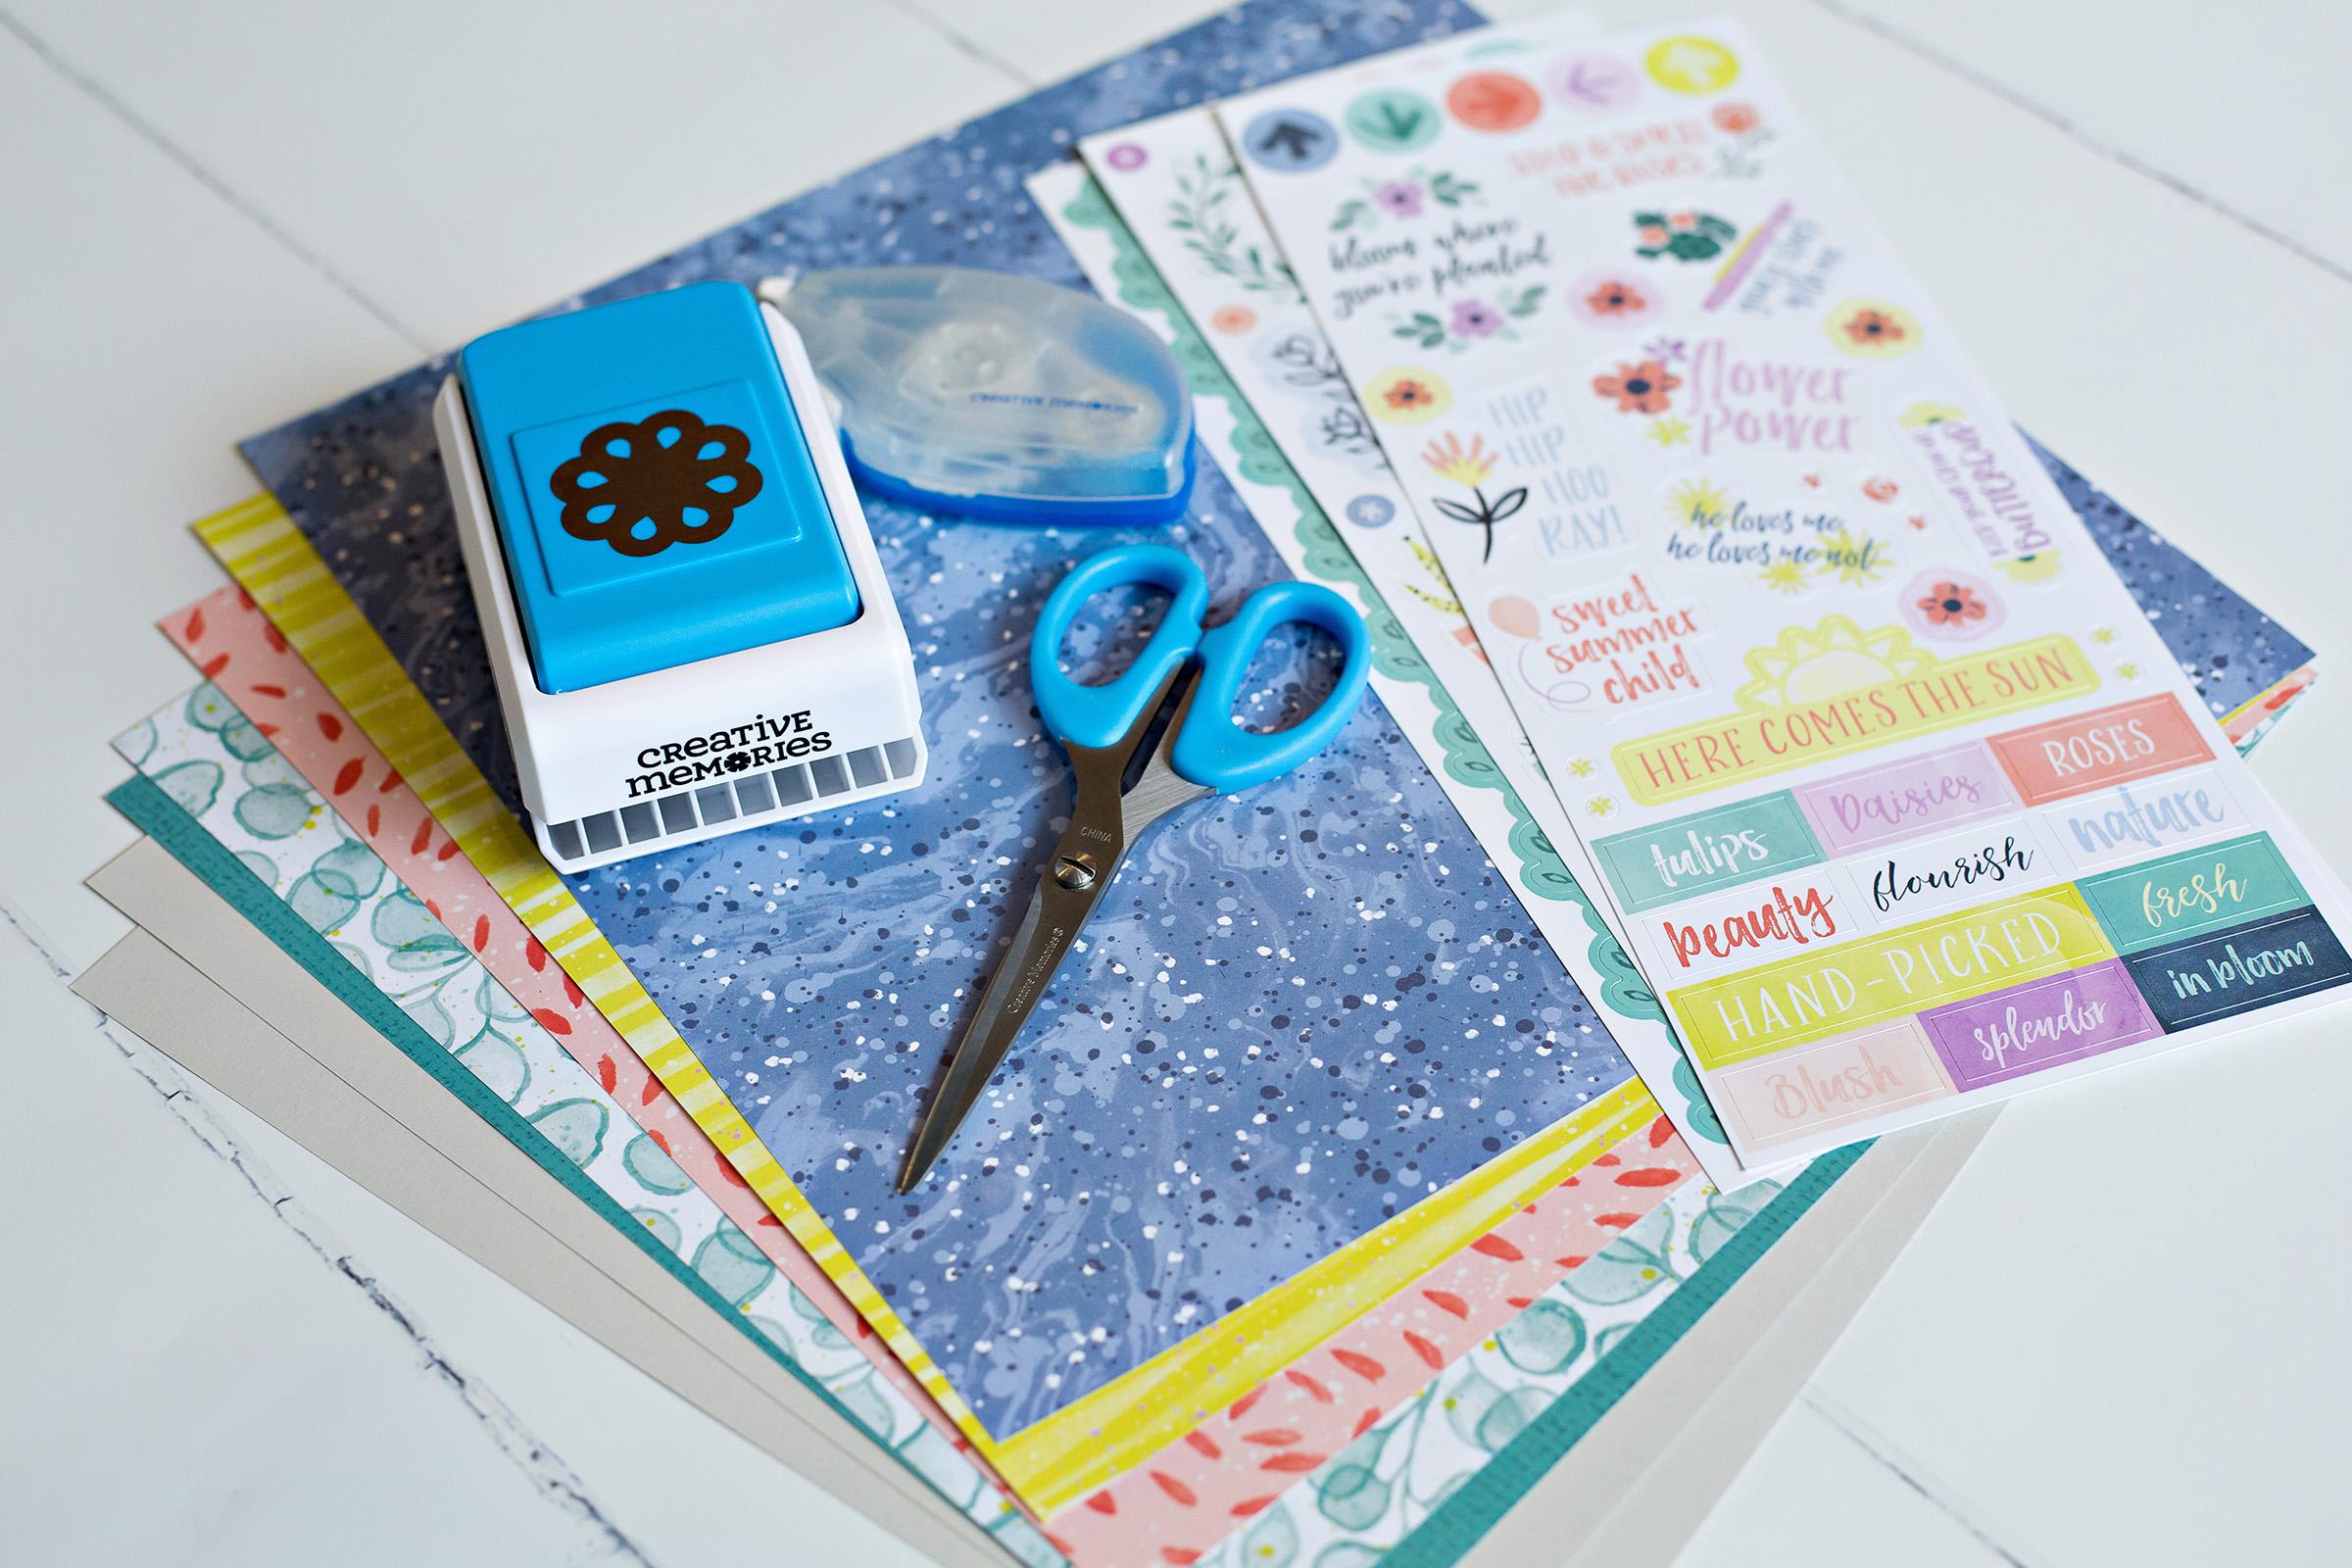 Throwback-Thursday-Scrapbook-Sketch-Full-Bloom-Supplies-Creative-Memories.jpg